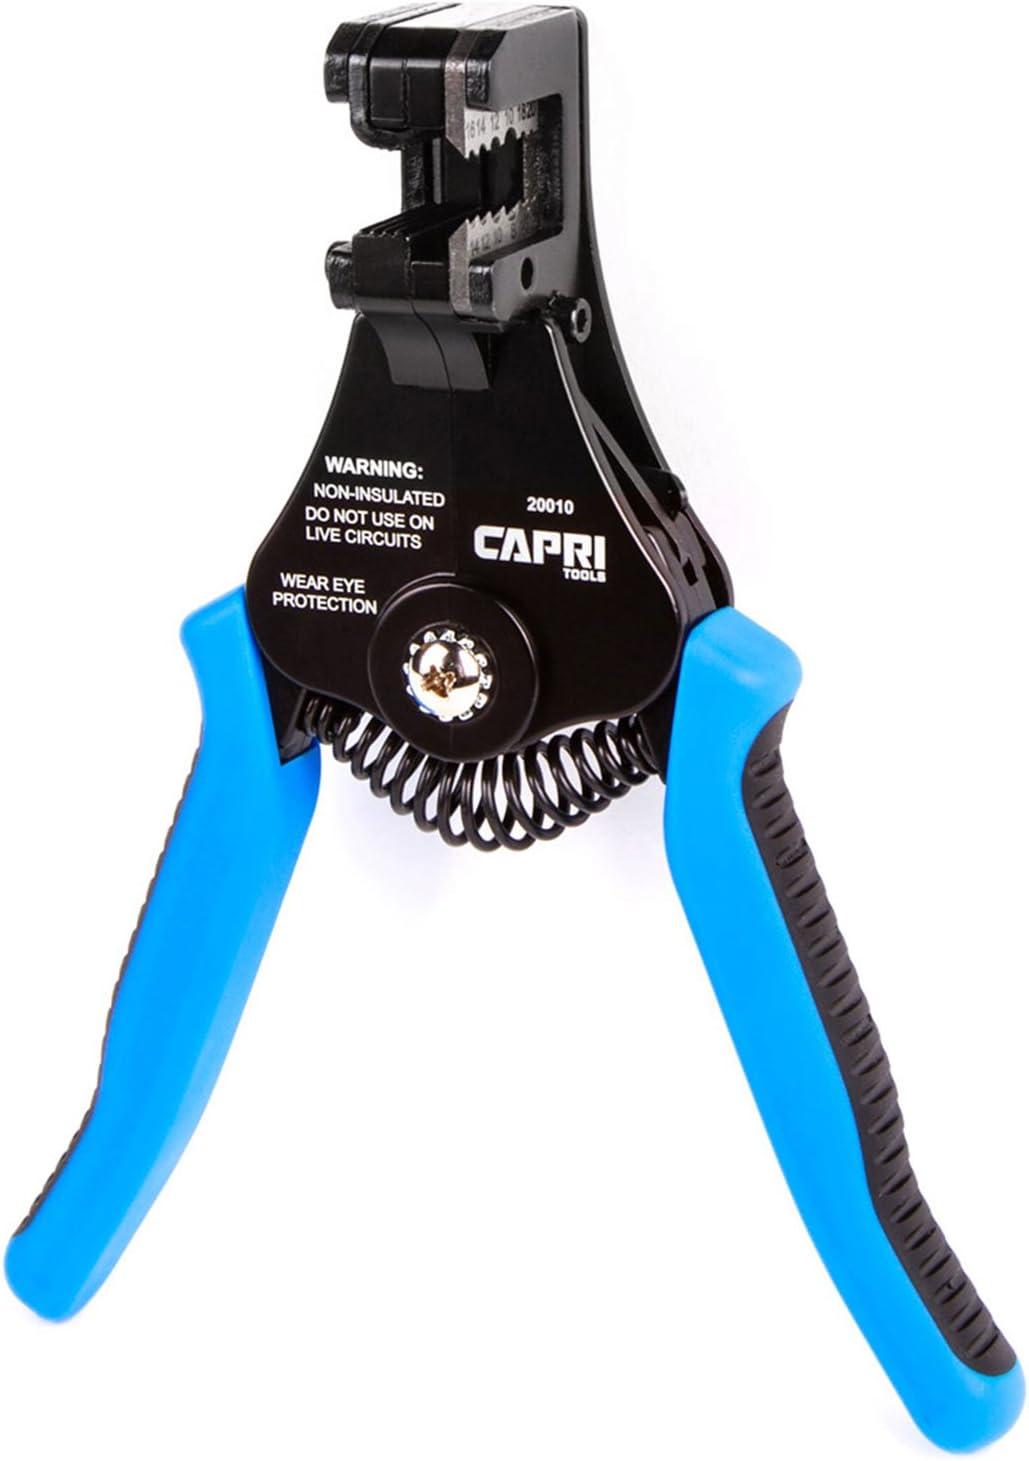 Capri Tools 20010 Wire Over item handling Max 75% OFF ☆ Precision Stripper